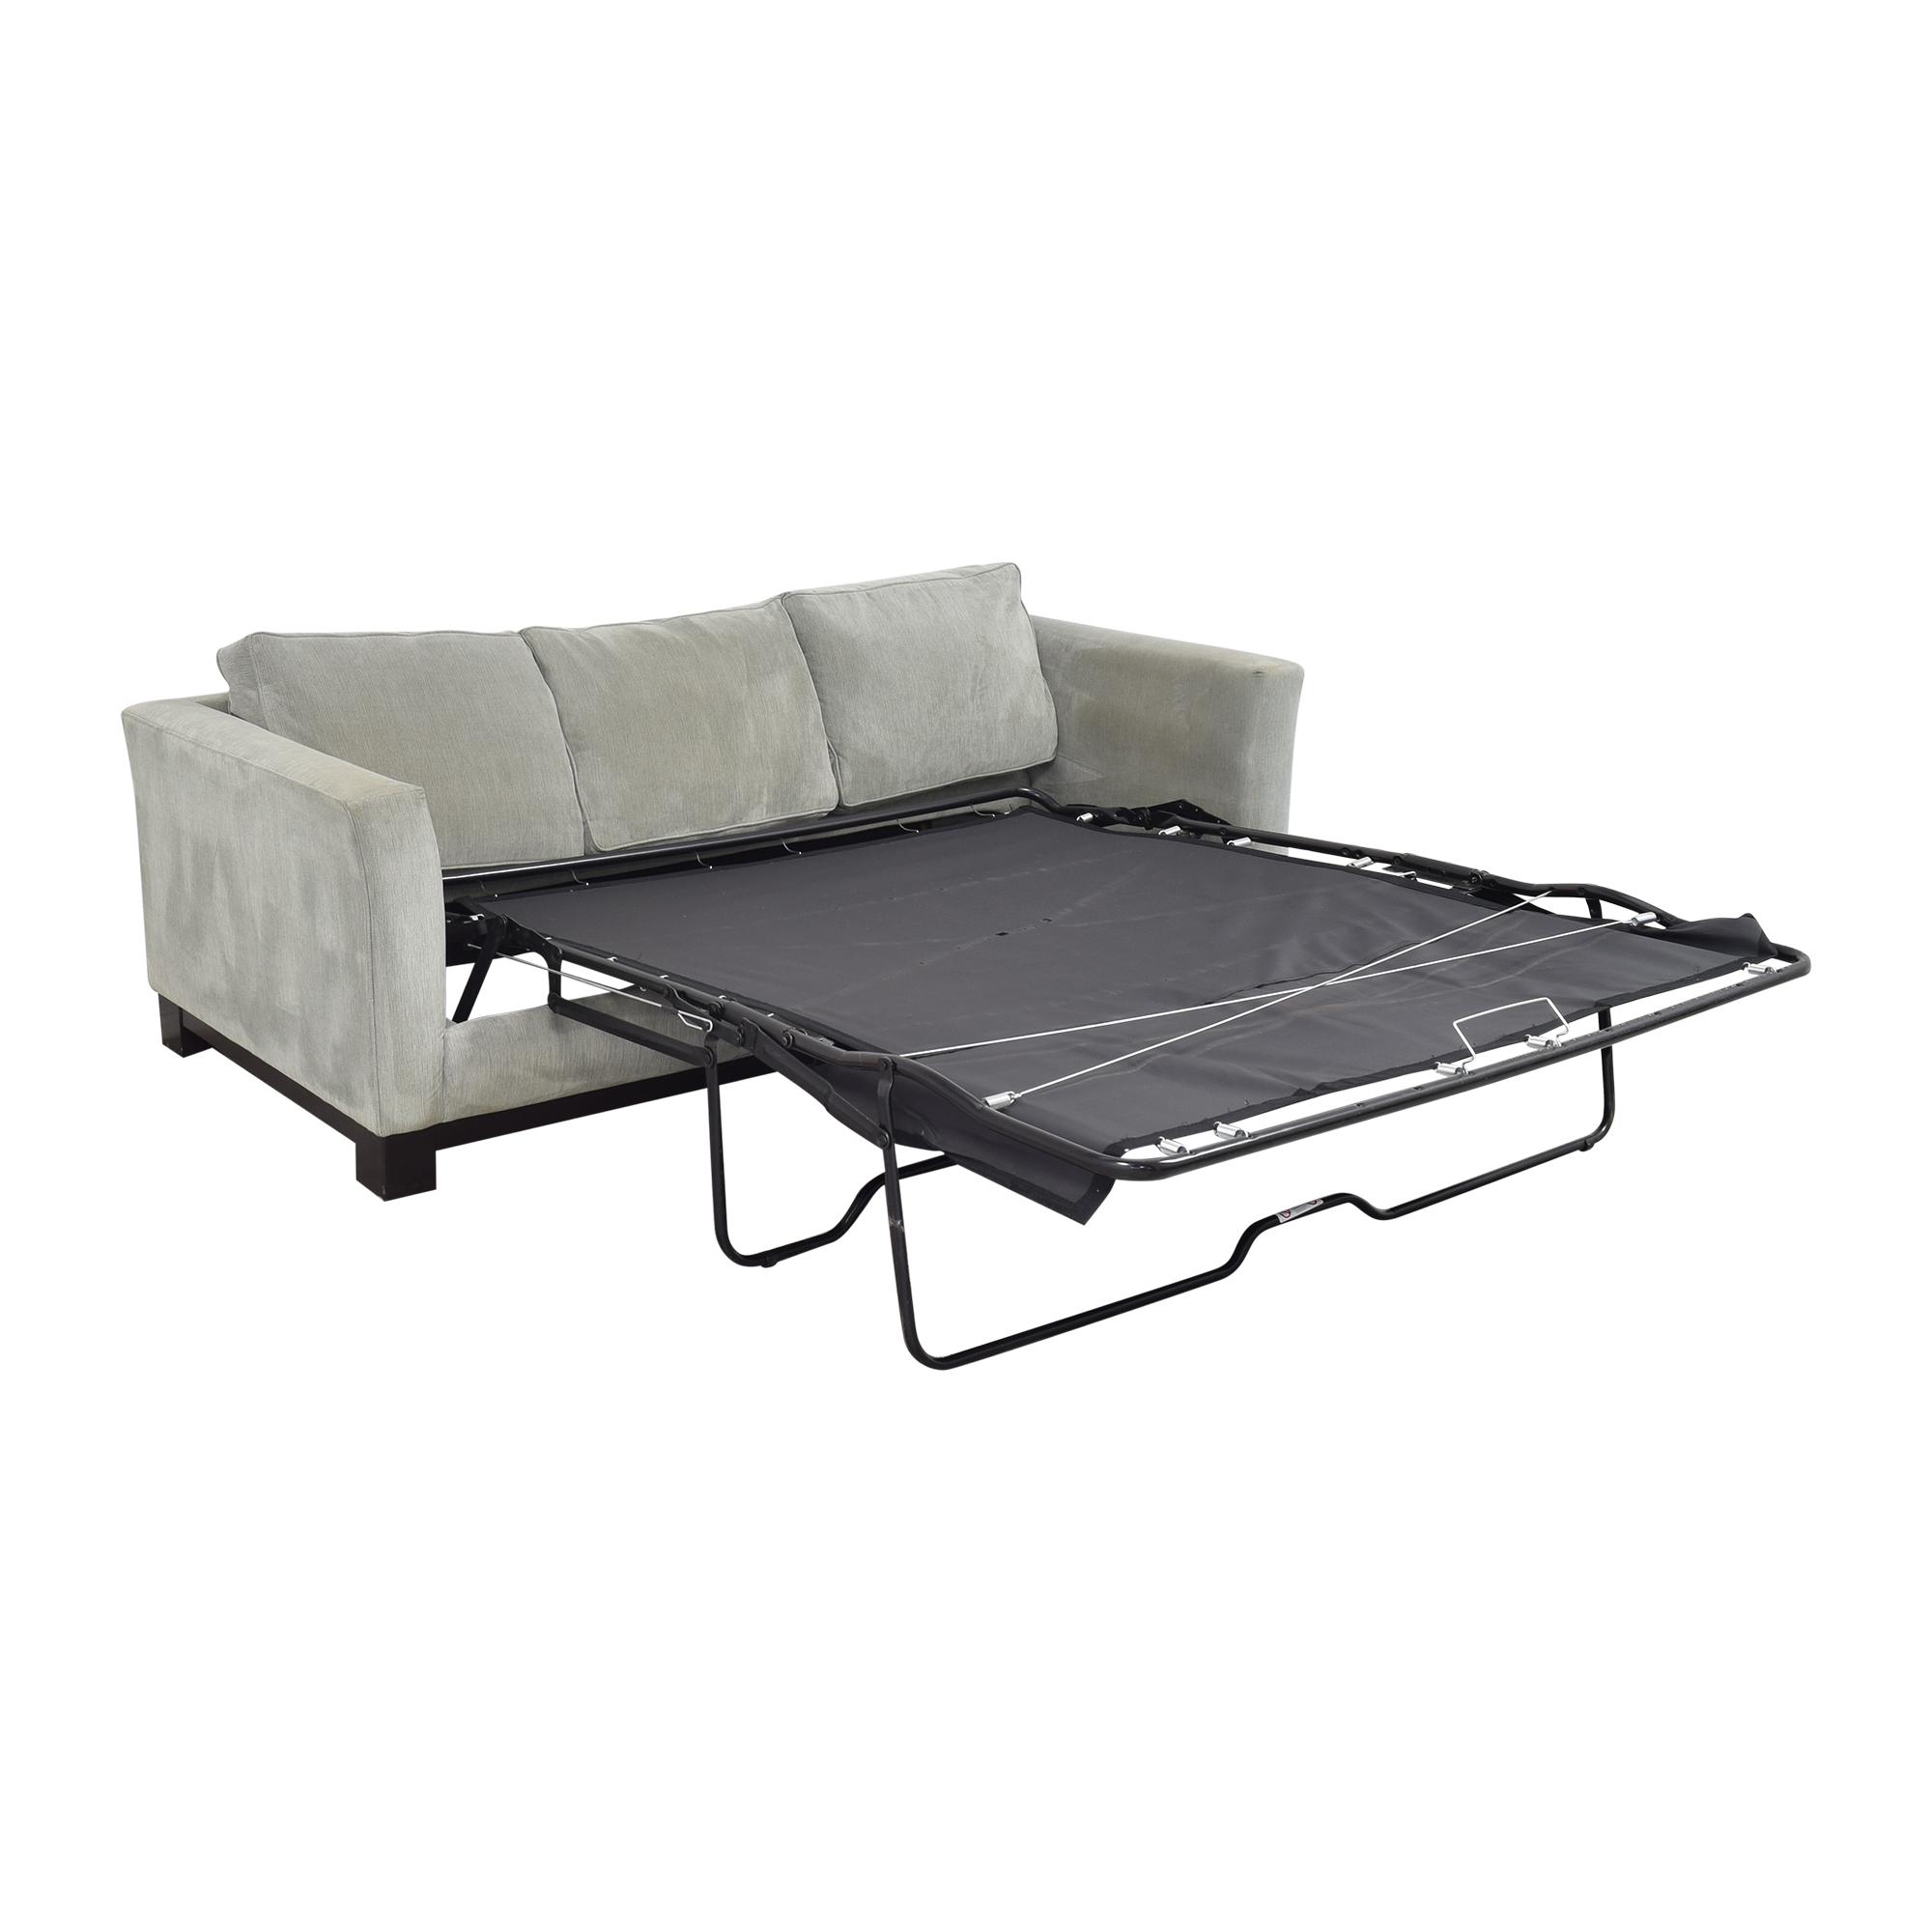 Macy's Kenton Sleeper Sofa Macy's